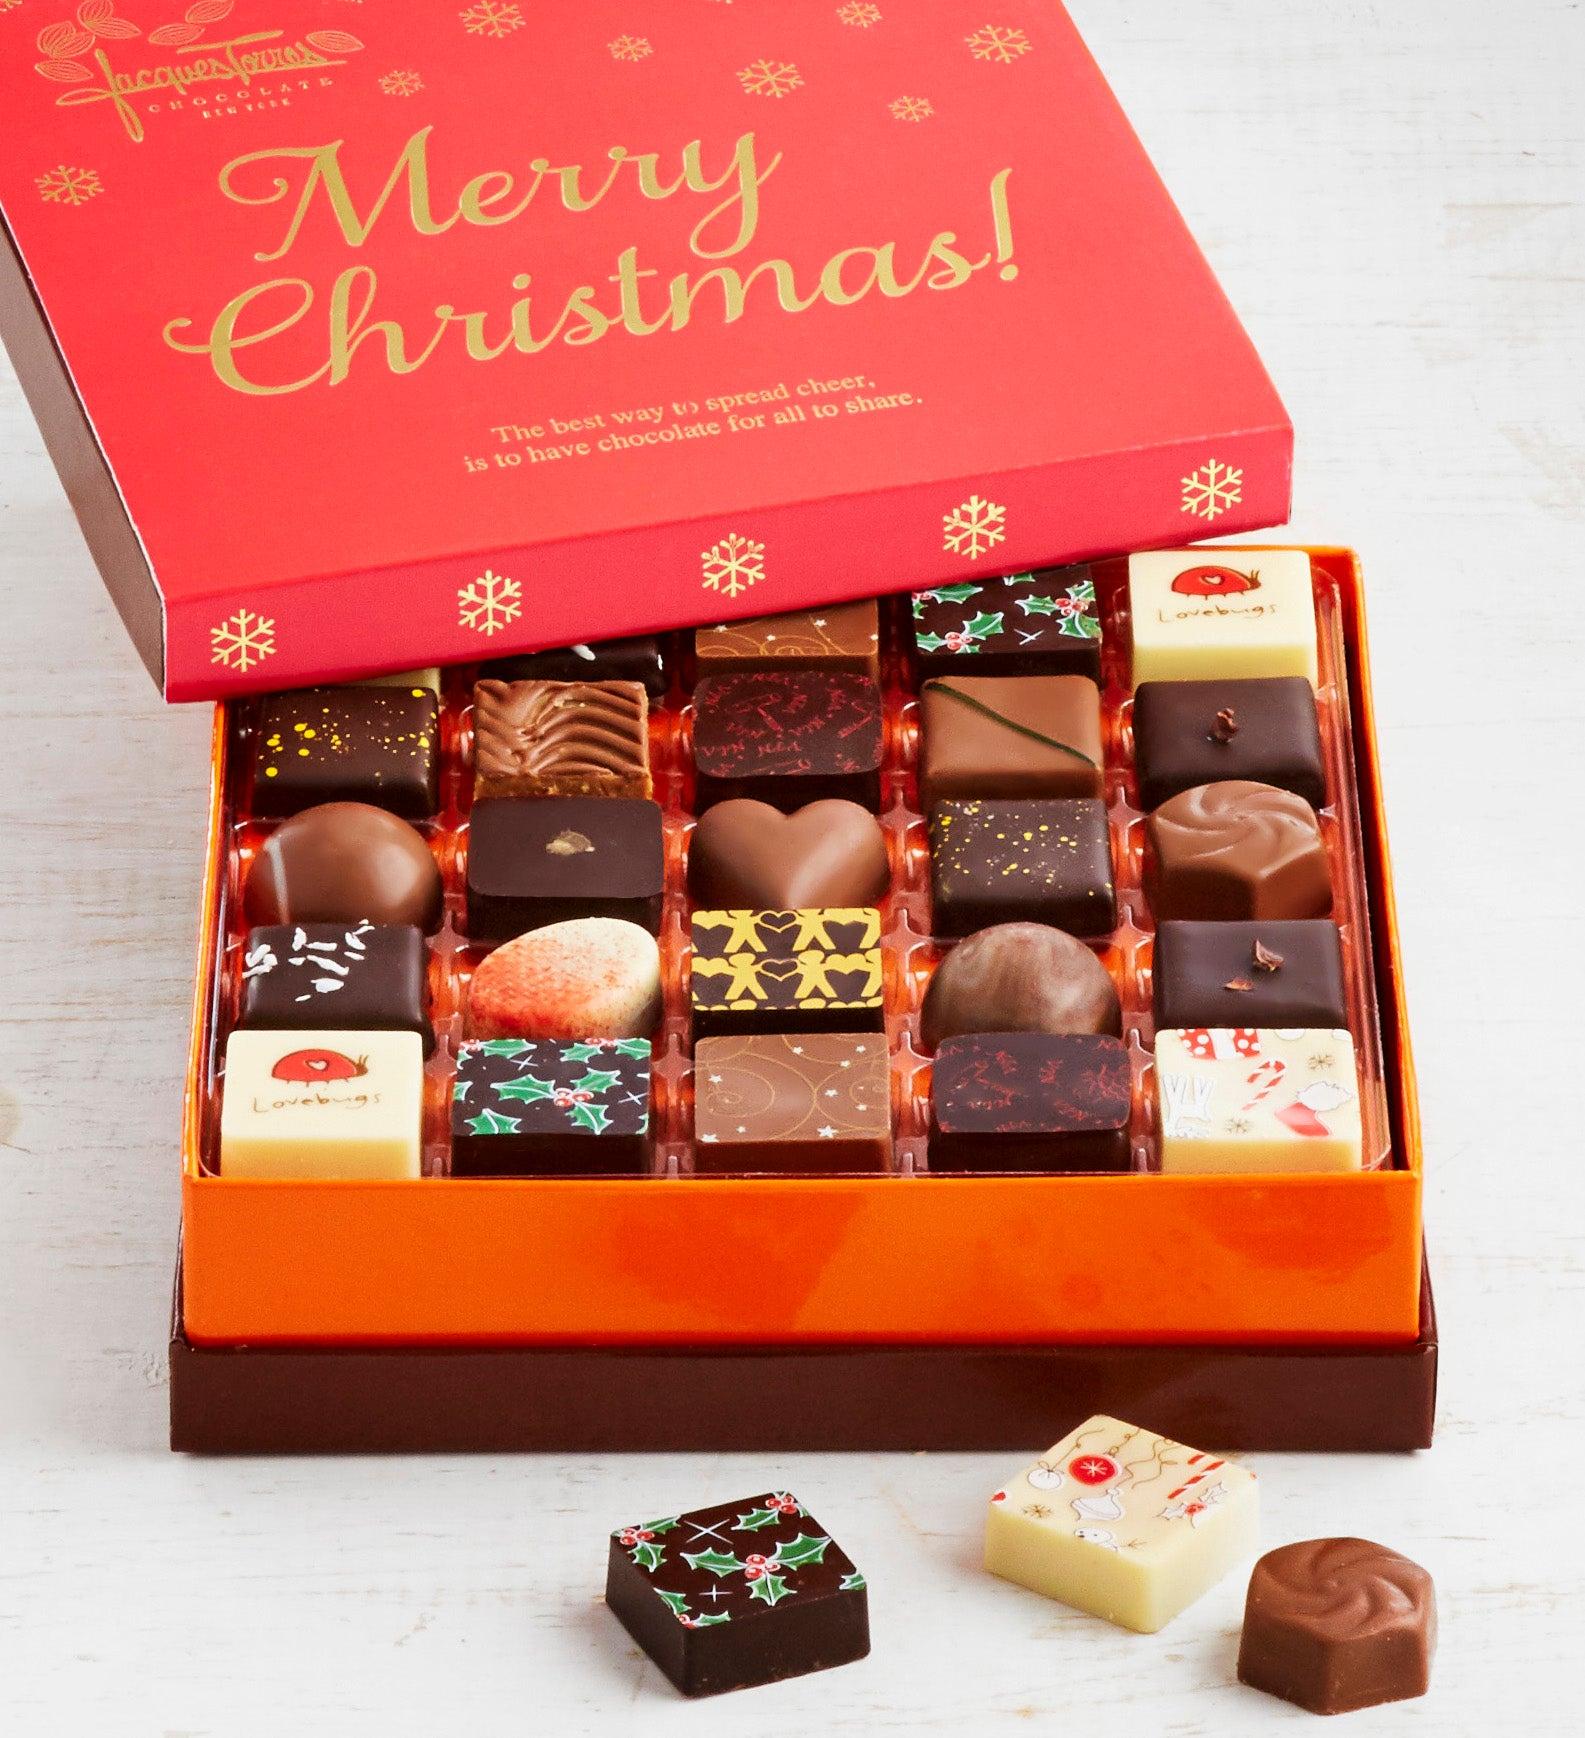 Jacques Torres Christmas Chocolates Box pc